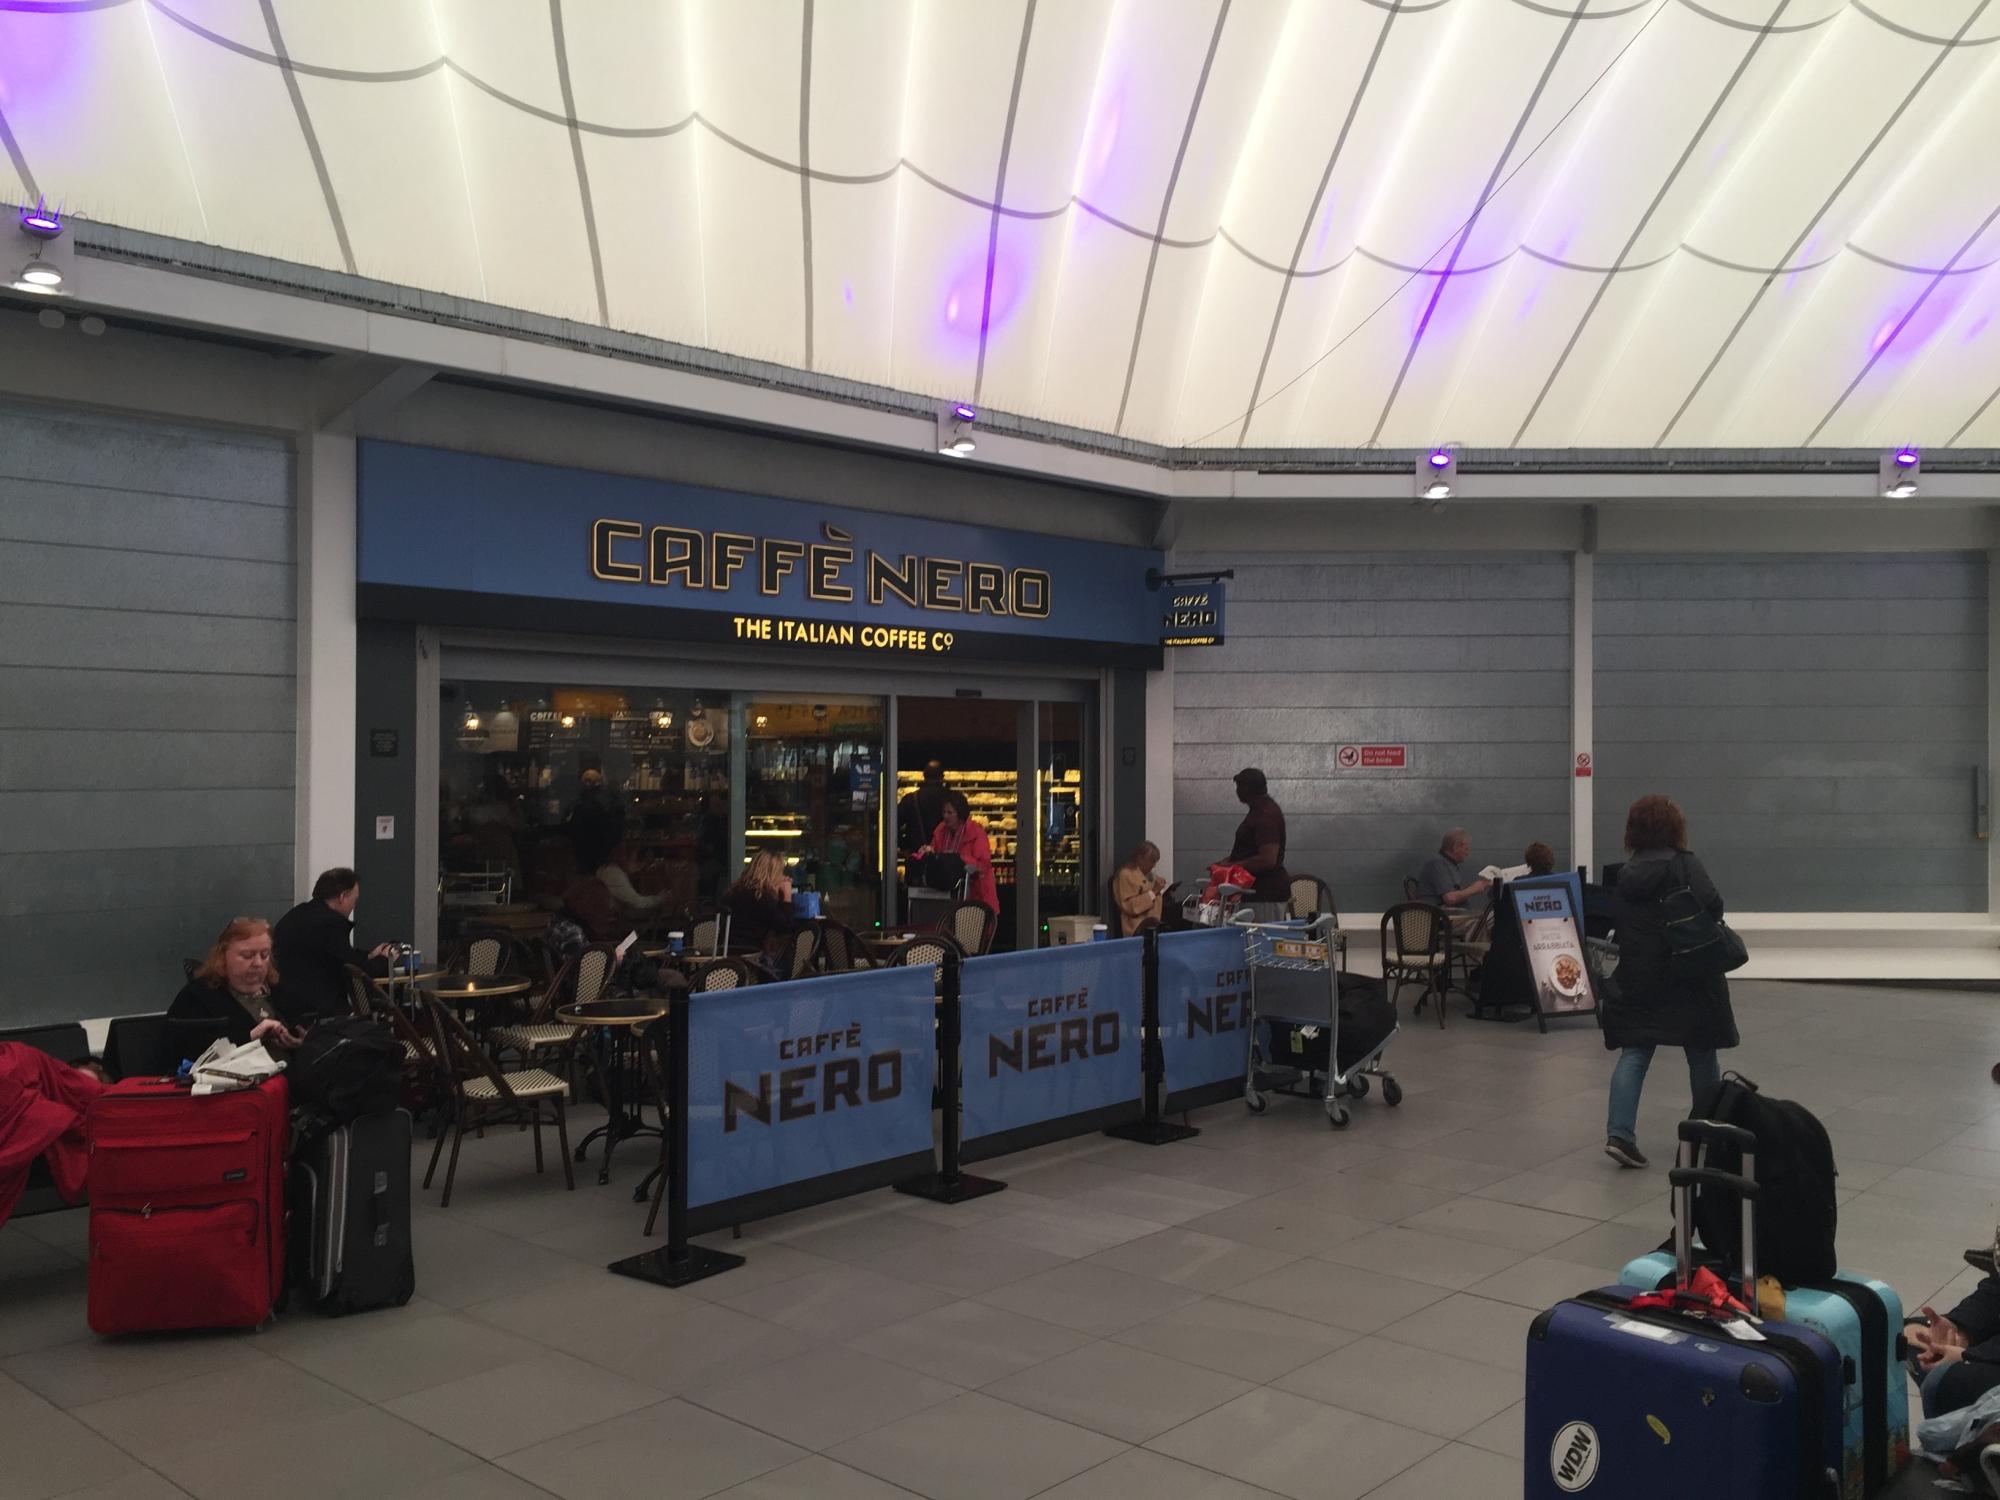 Heathrow Caffe Nero Central Bus Station